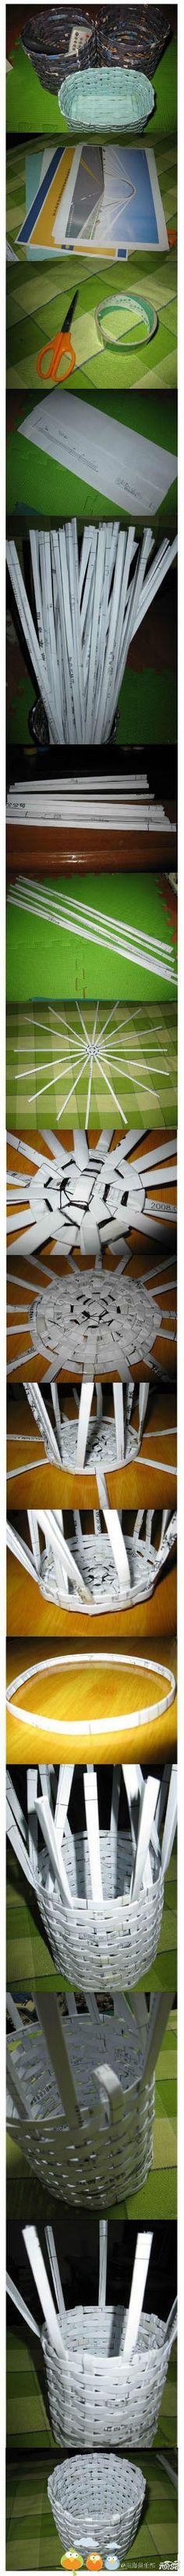 diy basket made of paper